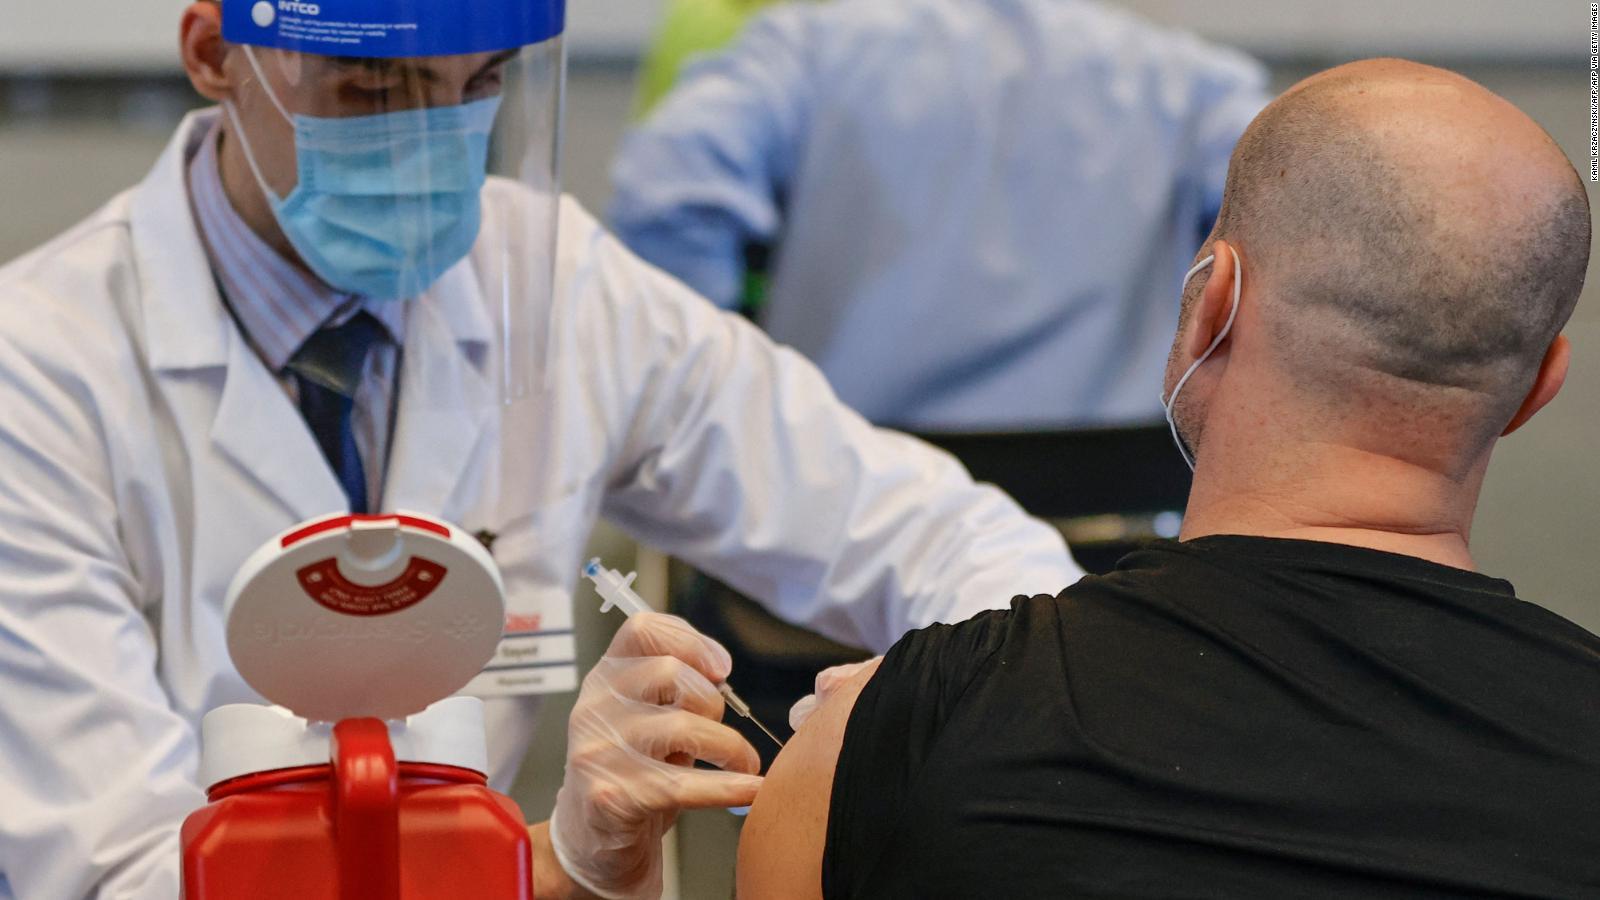 Johnson & Johnson vaccine: these are the symptoms of a rare case of clots